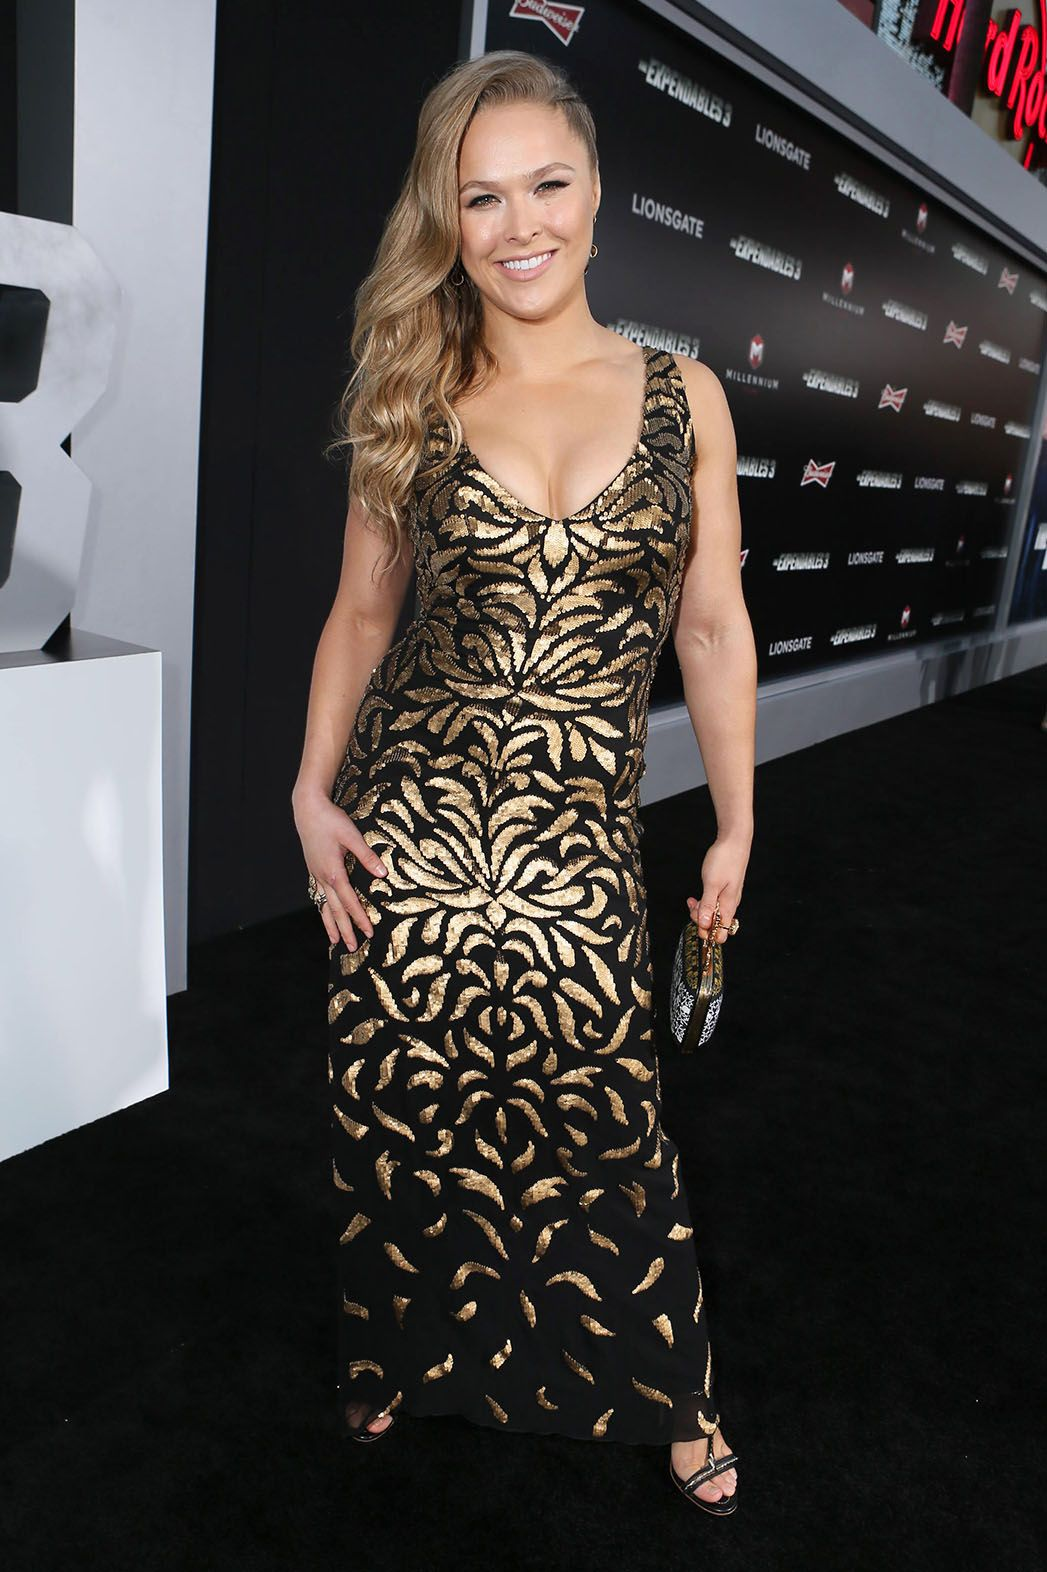 Expendables 3 Ronda Rousey Dress | Ronda Rousey mi favorita ...